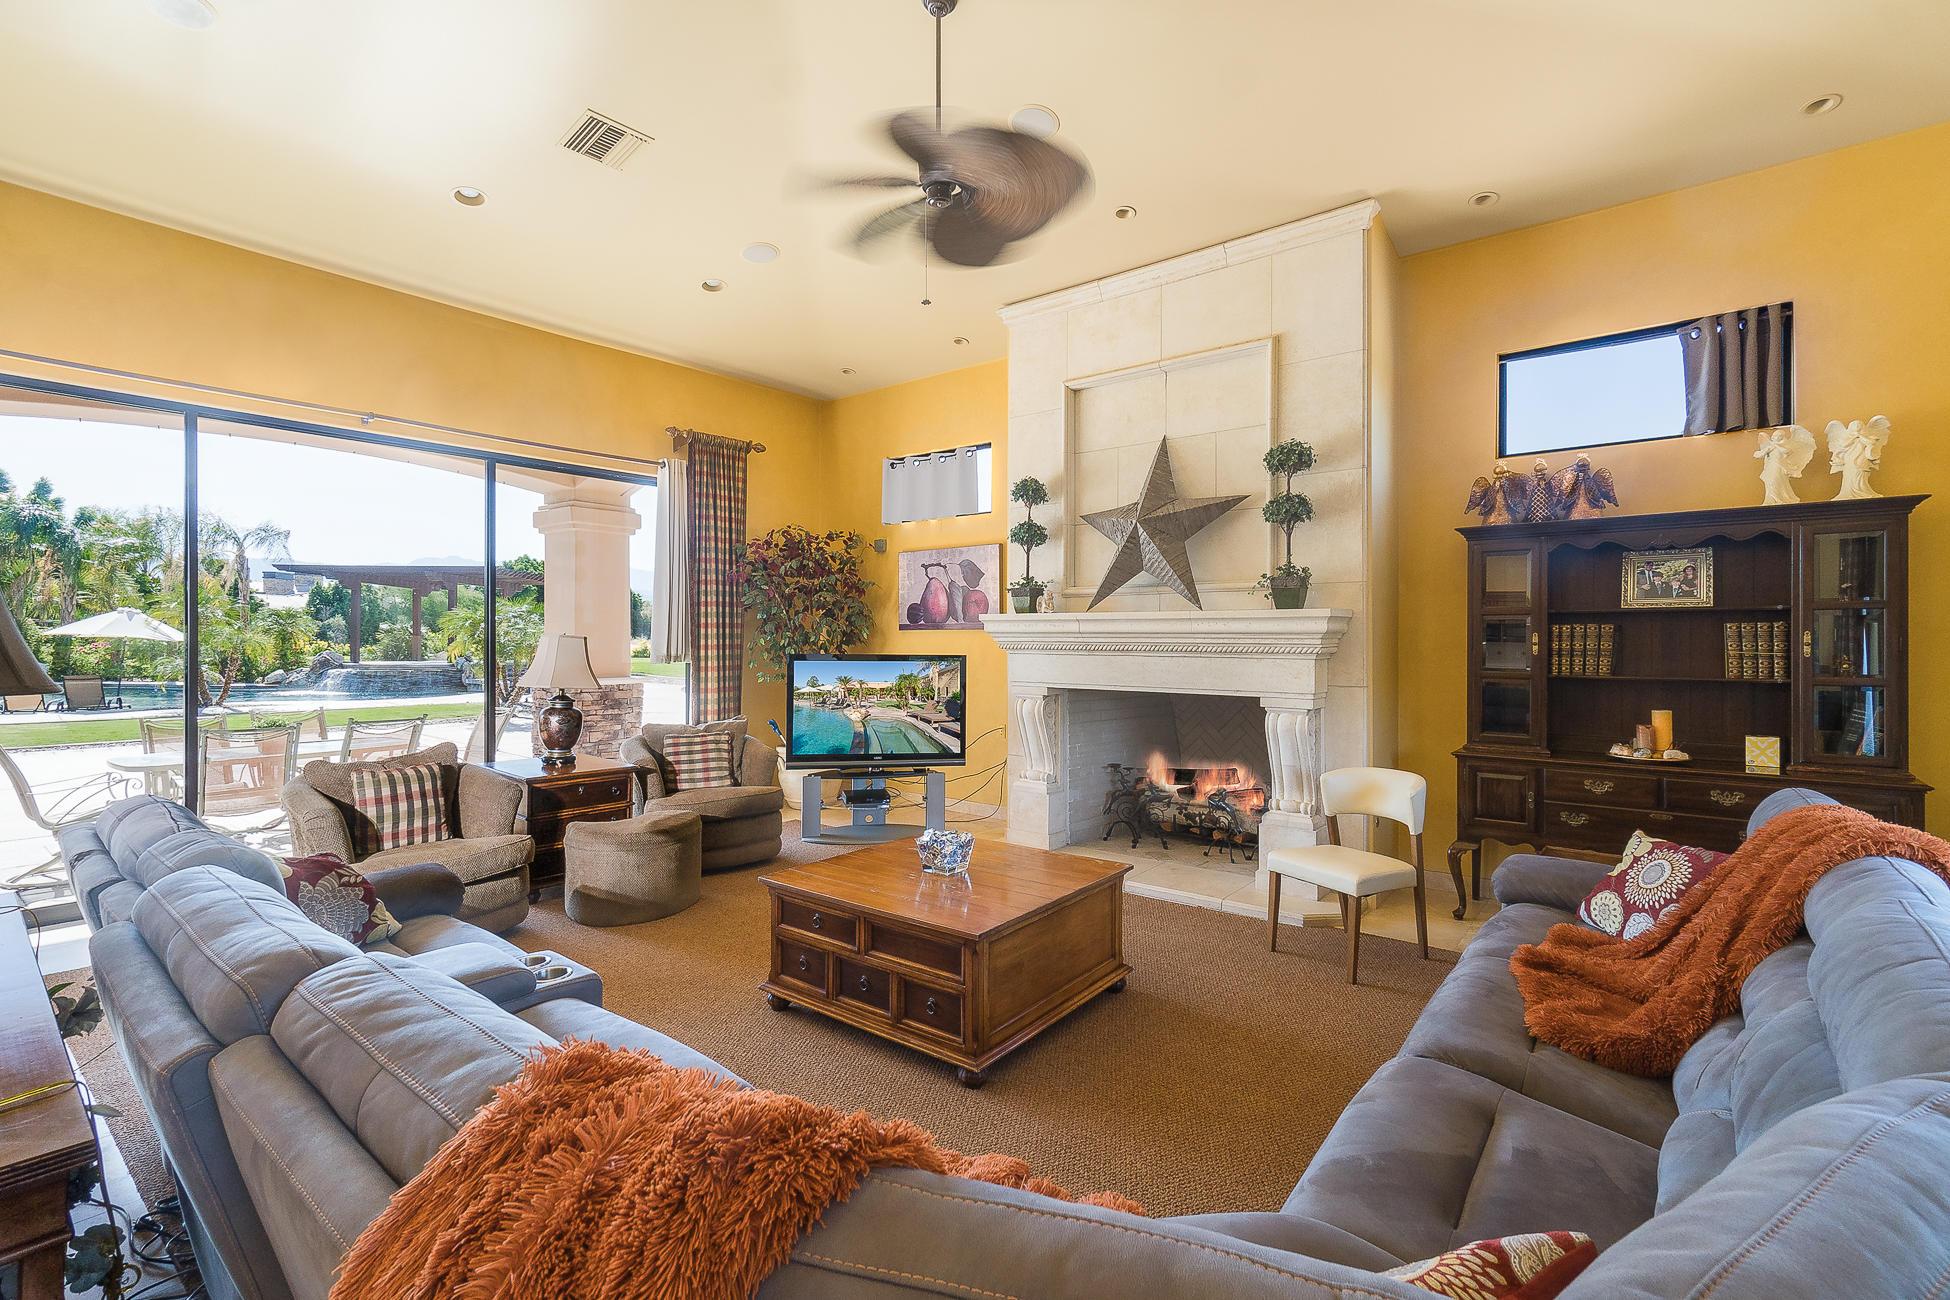 41289 Yucca Lane, Bermuda Dunes, California 92203, 4 Bedrooms Bedrooms, ,5 BathroomsBathrooms,Residential,For Sale,41289 Yucca Lane,219034854